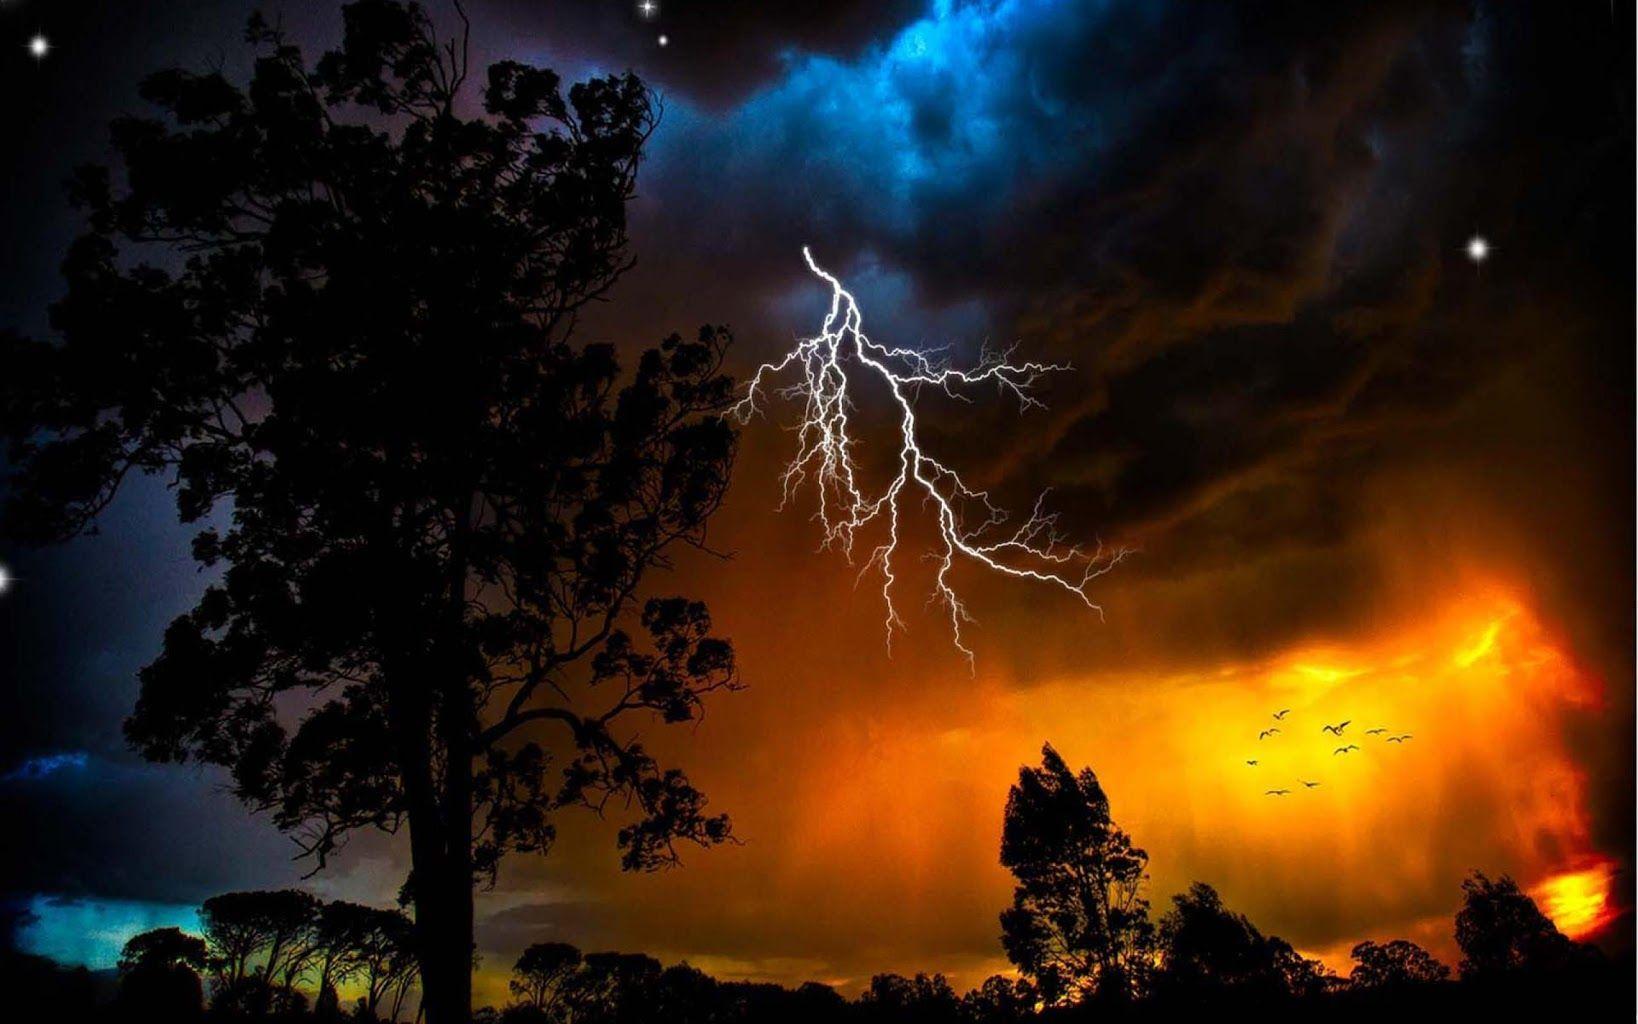 Storm Live Wallpaper Download   Lightning Storm Live Wallpaper 1638x1024